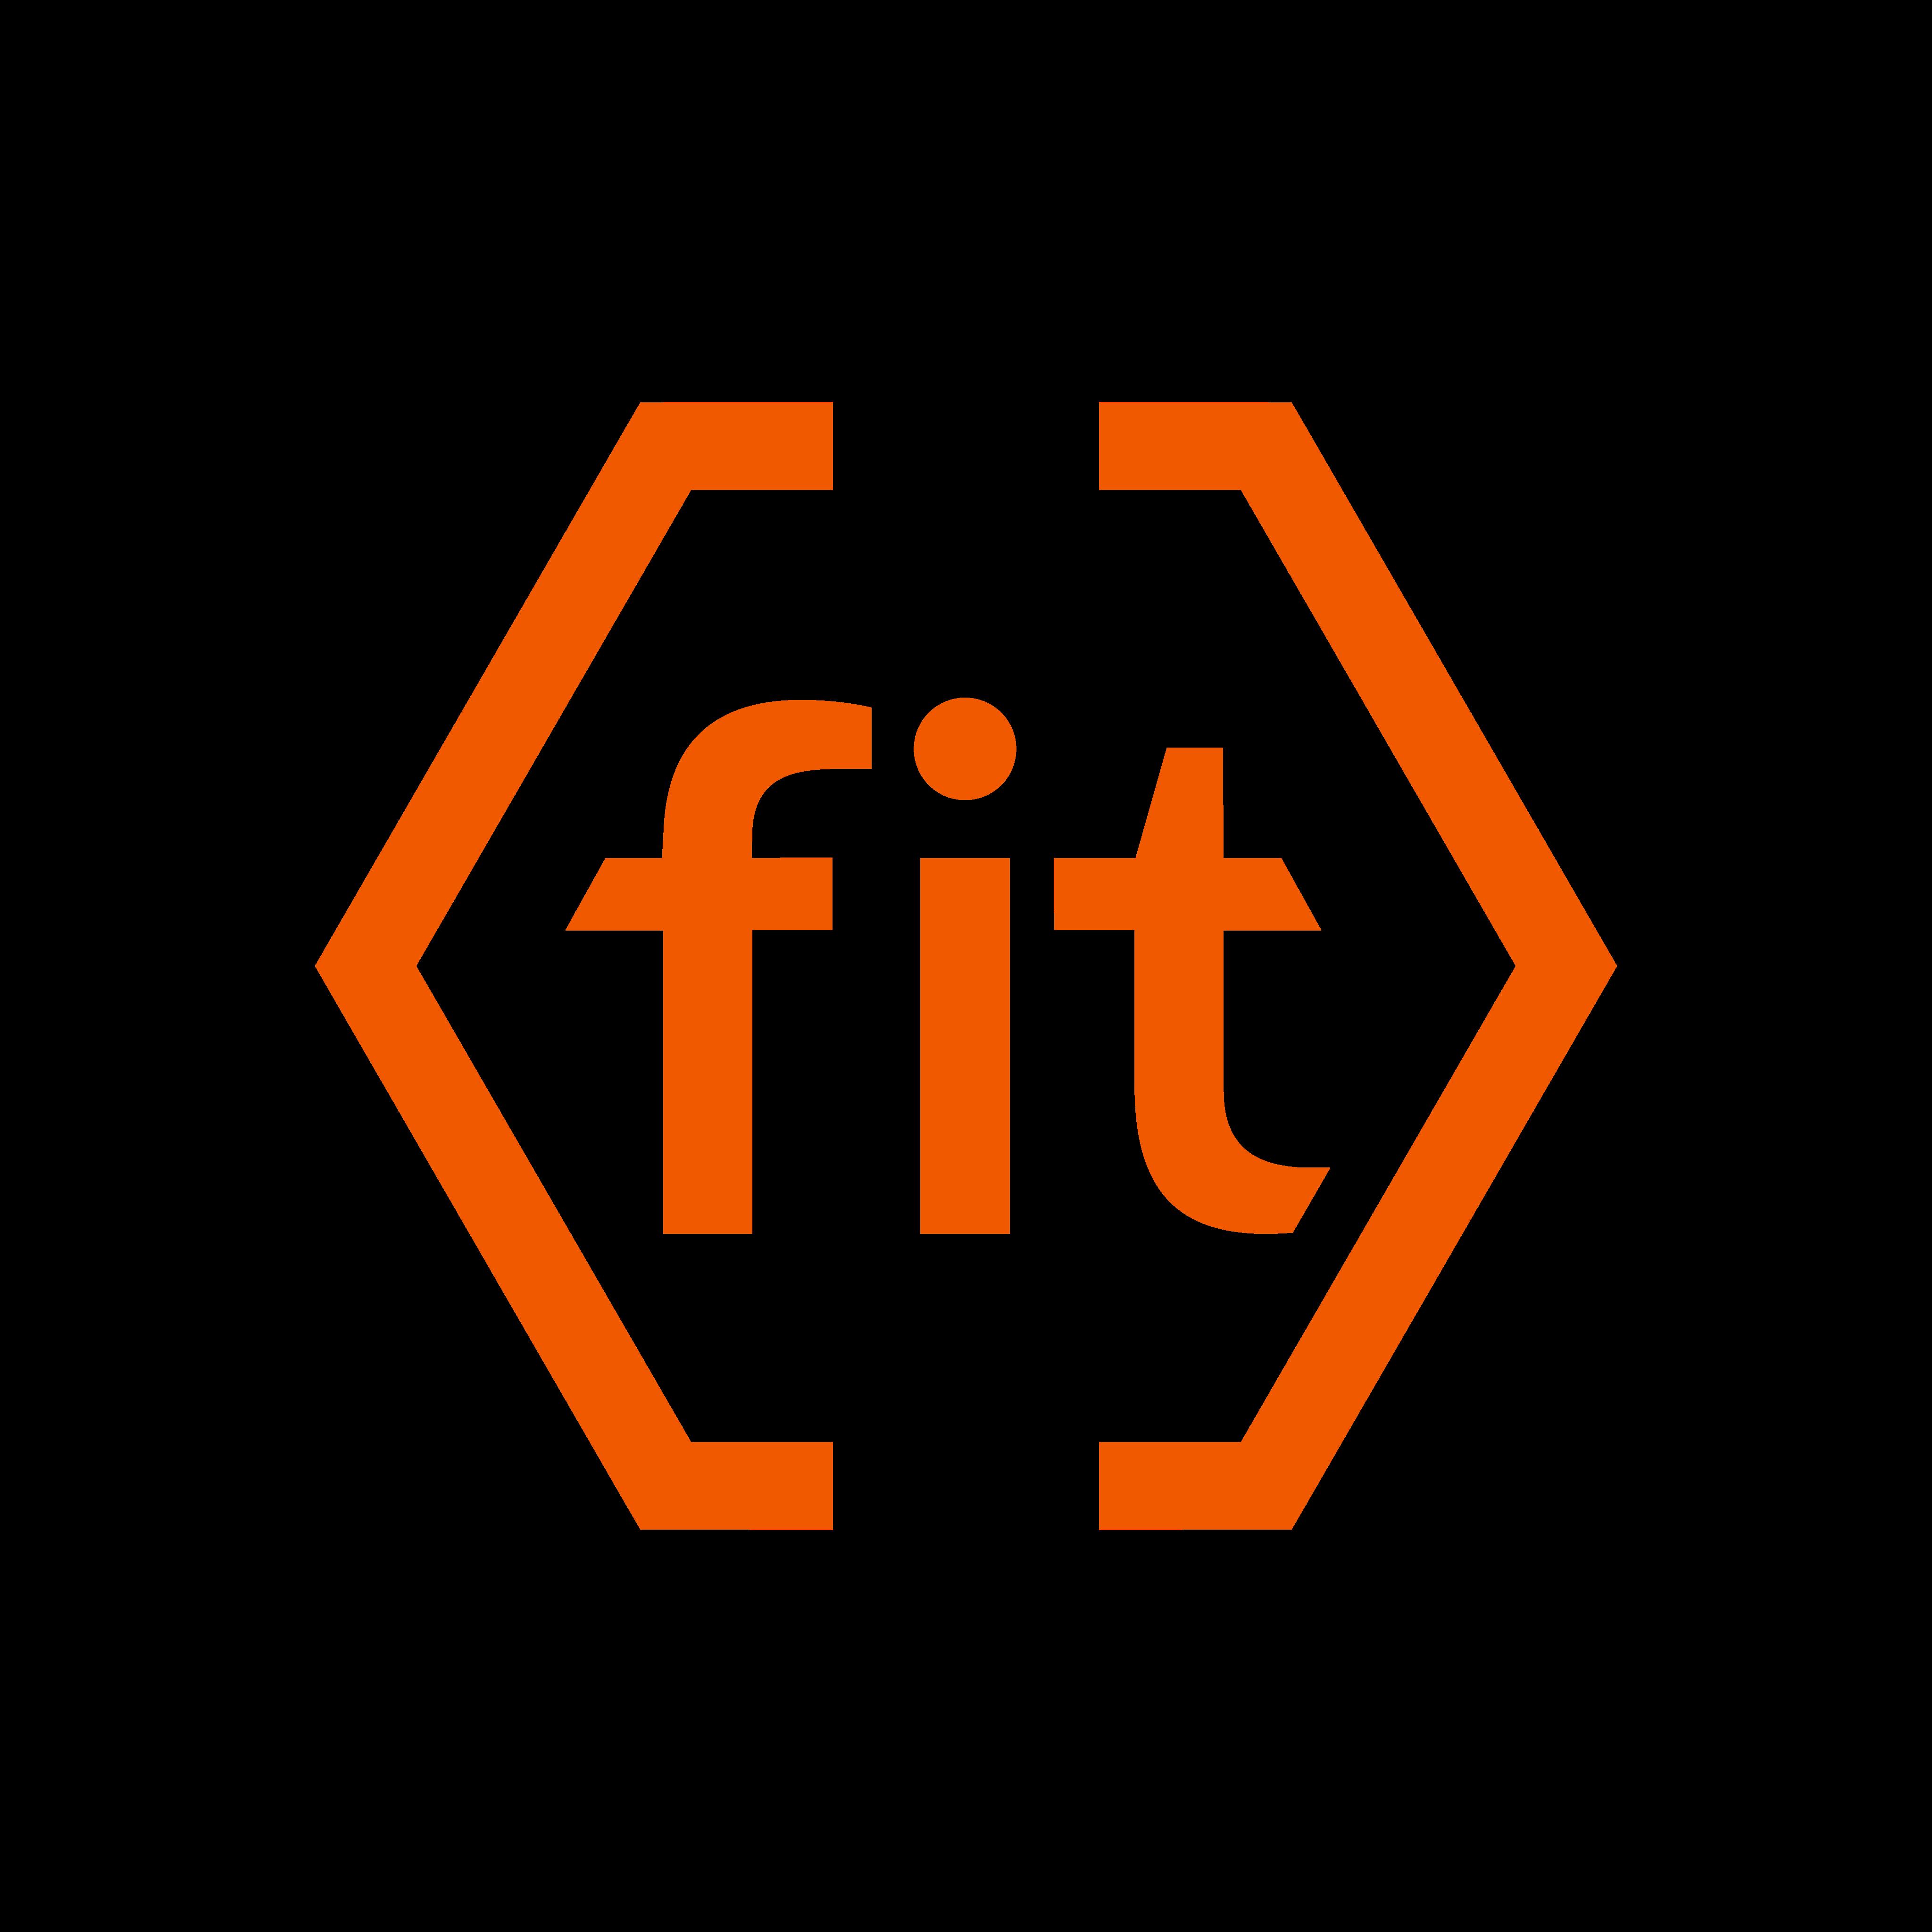 fit logo 0 - FIT Logo